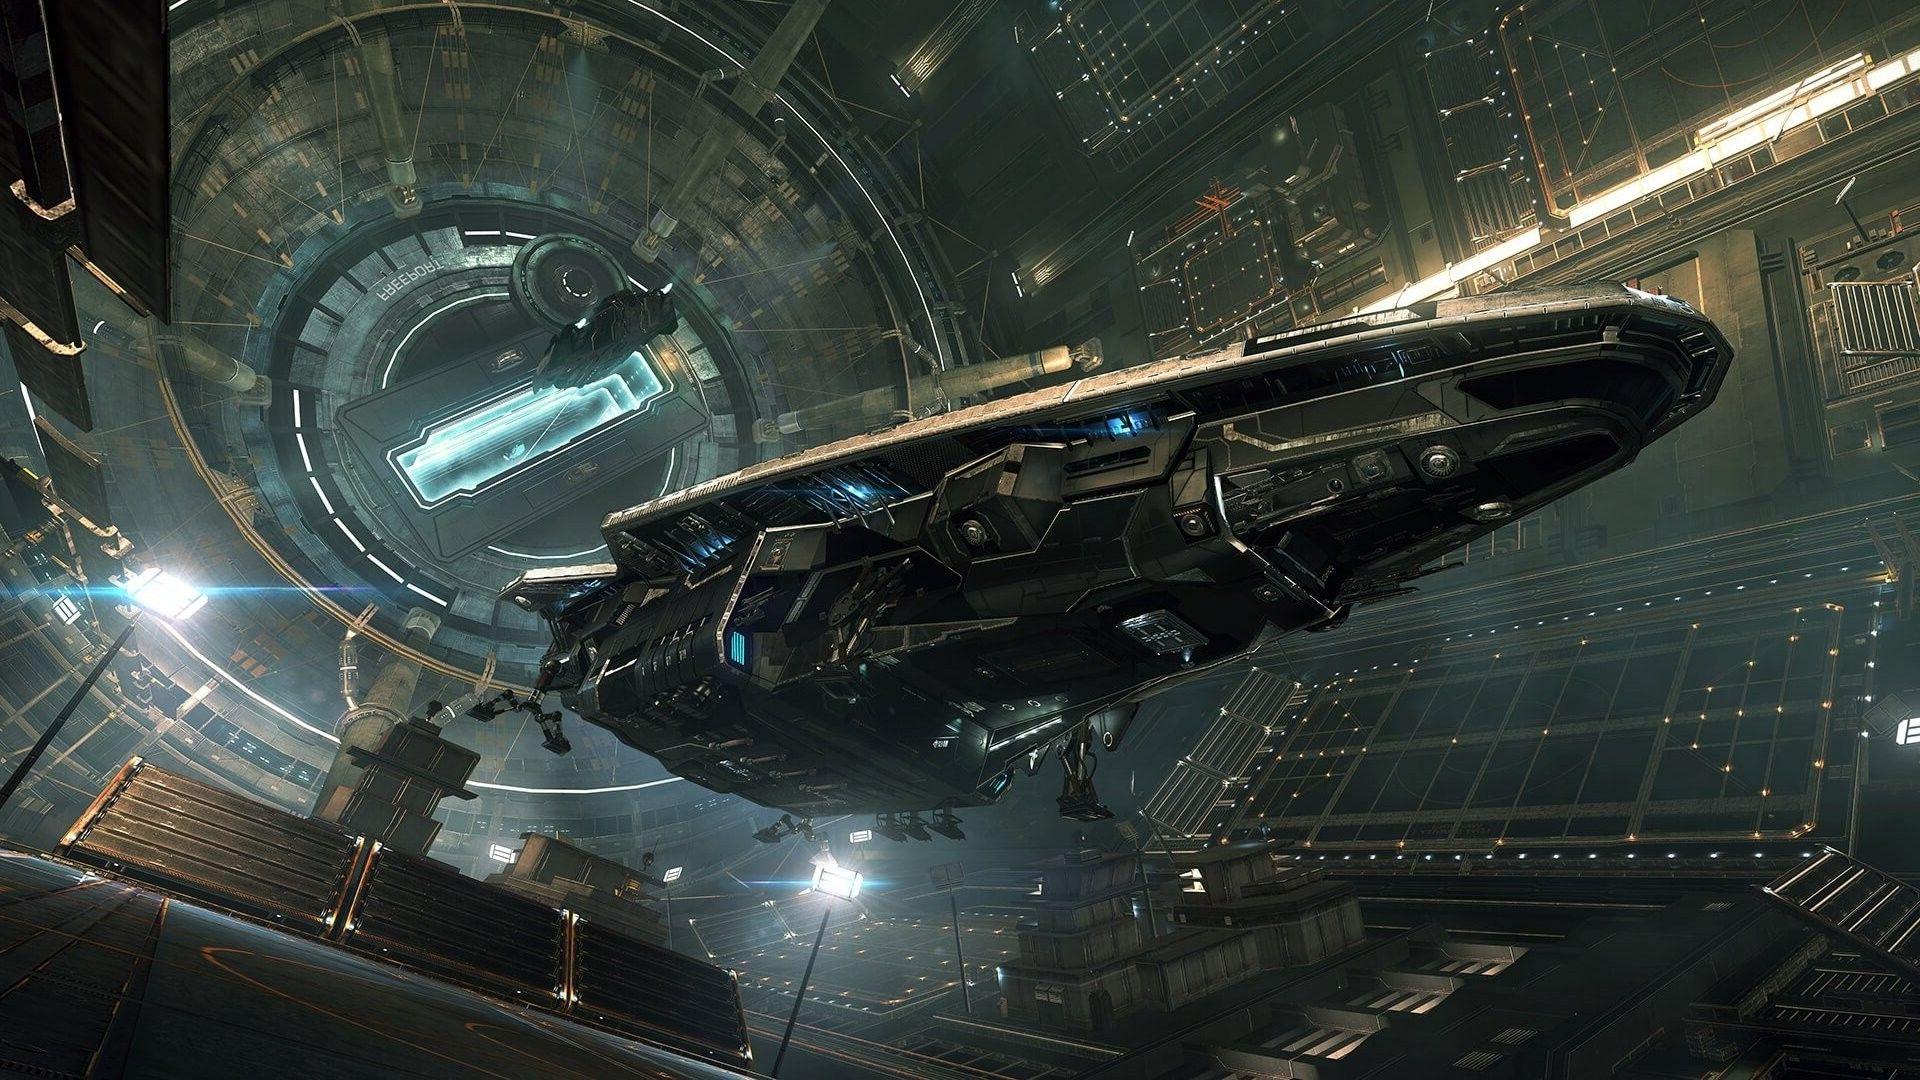 Elite Dangerous Video Games Science Fiction Spaceship Anaconda Spaceship Wallpaper Star Citizen Elite Dangerous Ships Sci Fi Ships